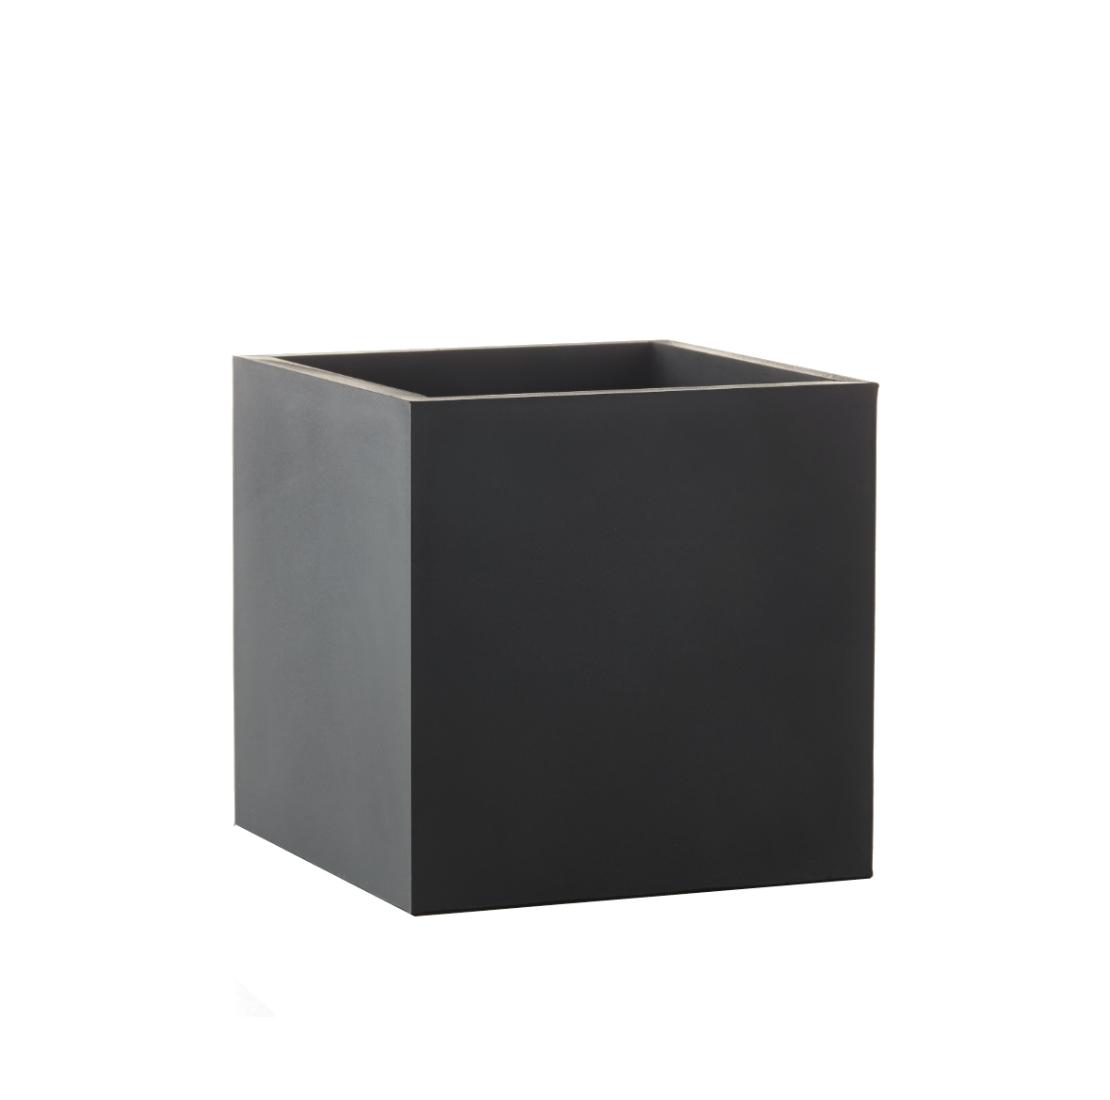 Krukke - Multi Kvadrat Medium Sort - 12 x 12 x 12 cm